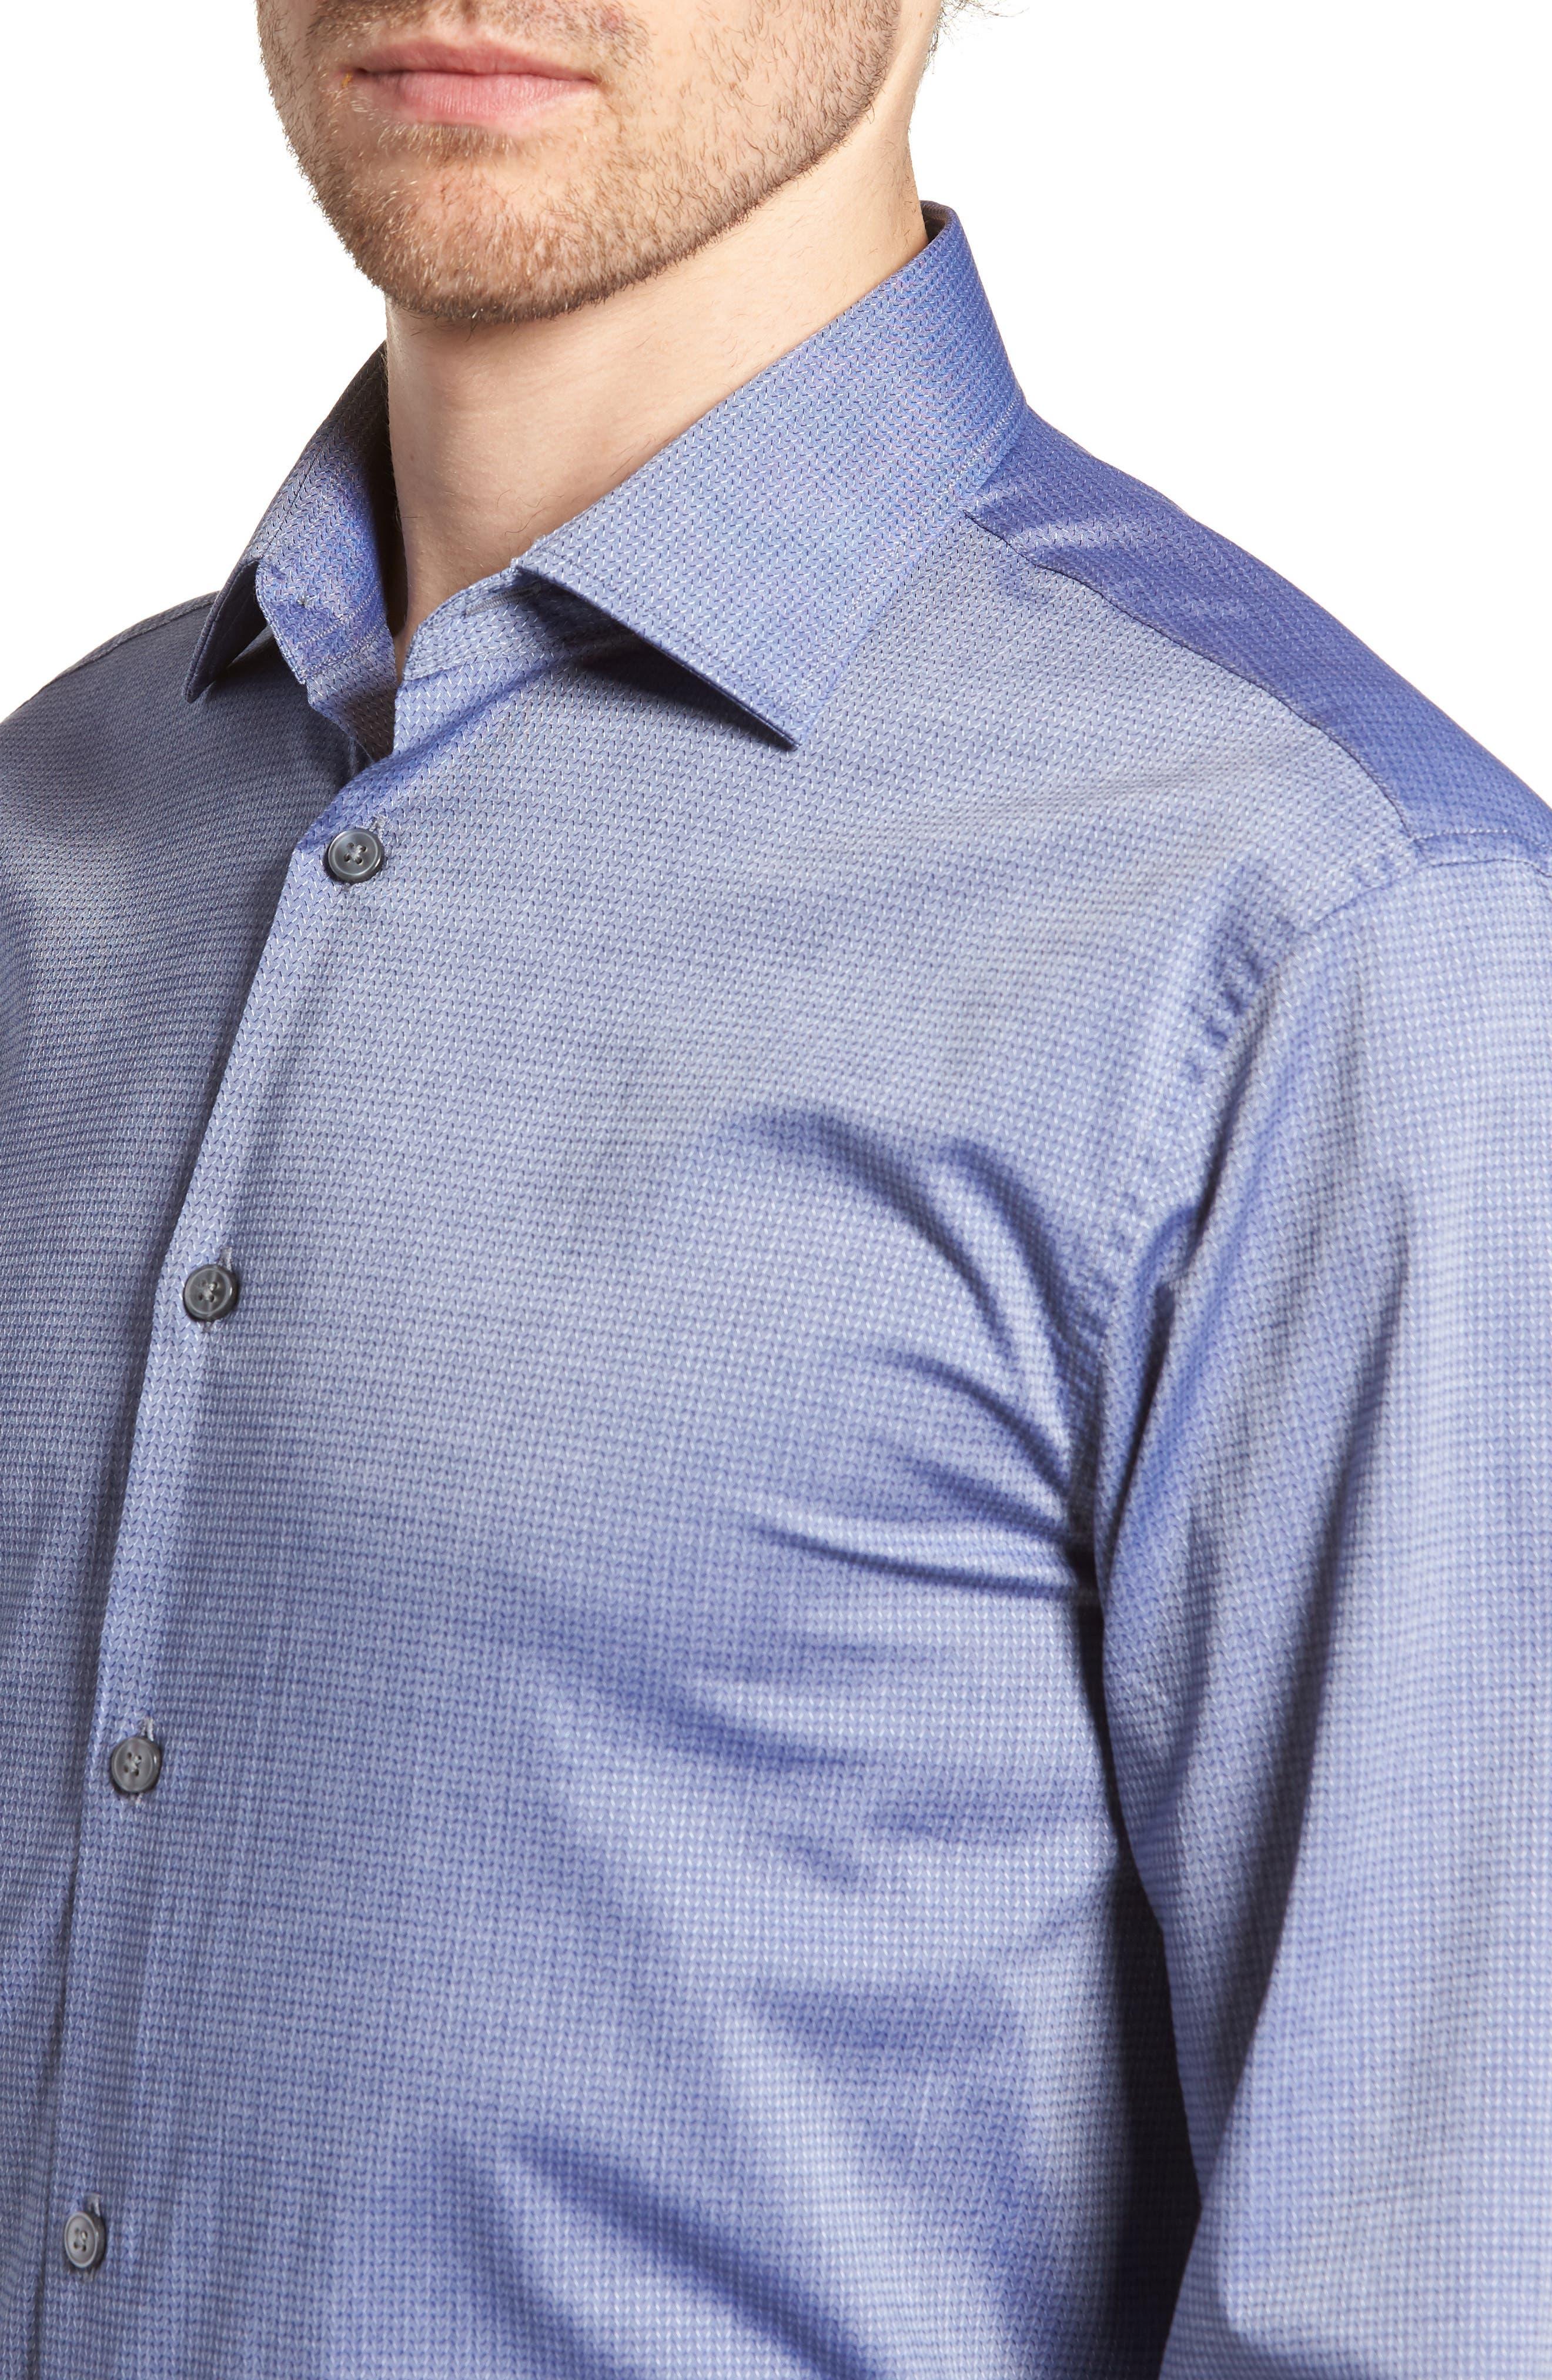 Regular Fit Stretch Print Dress Shirt,                             Alternate thumbnail 2, color,                             DEEP BLUE